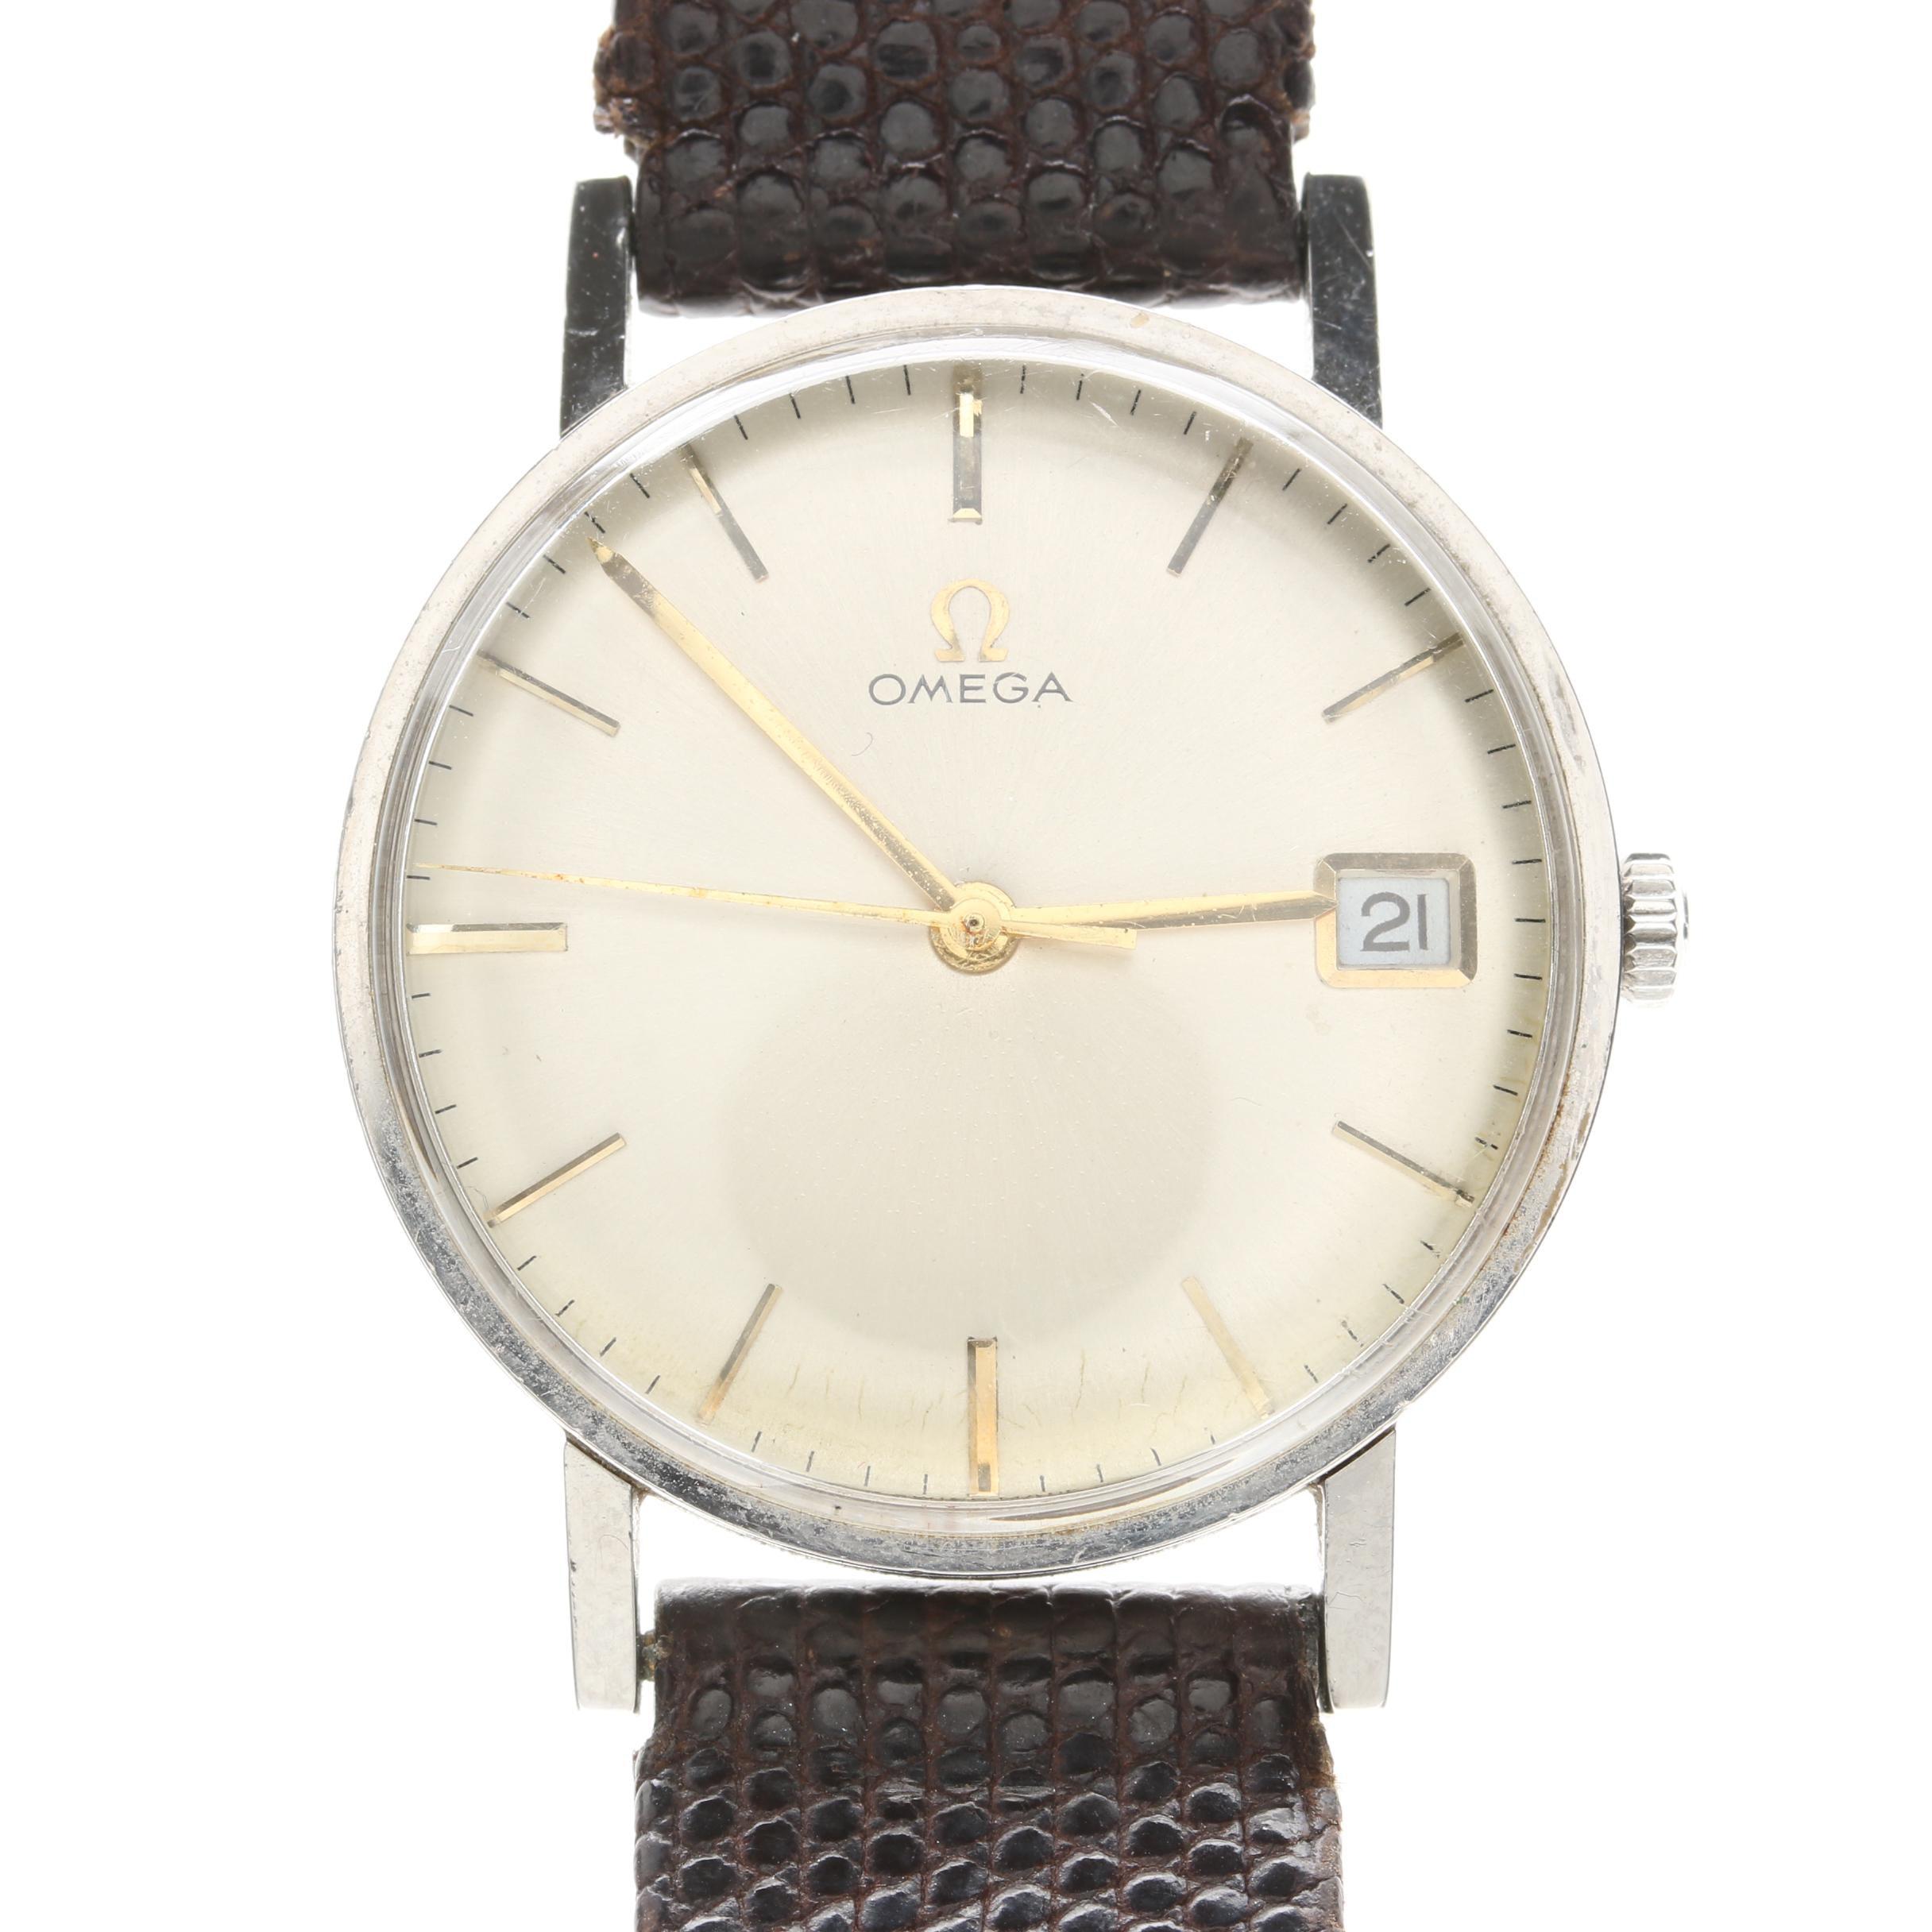 Circa 1960's Omega Stainless Steel Stem Wind Wristwatch